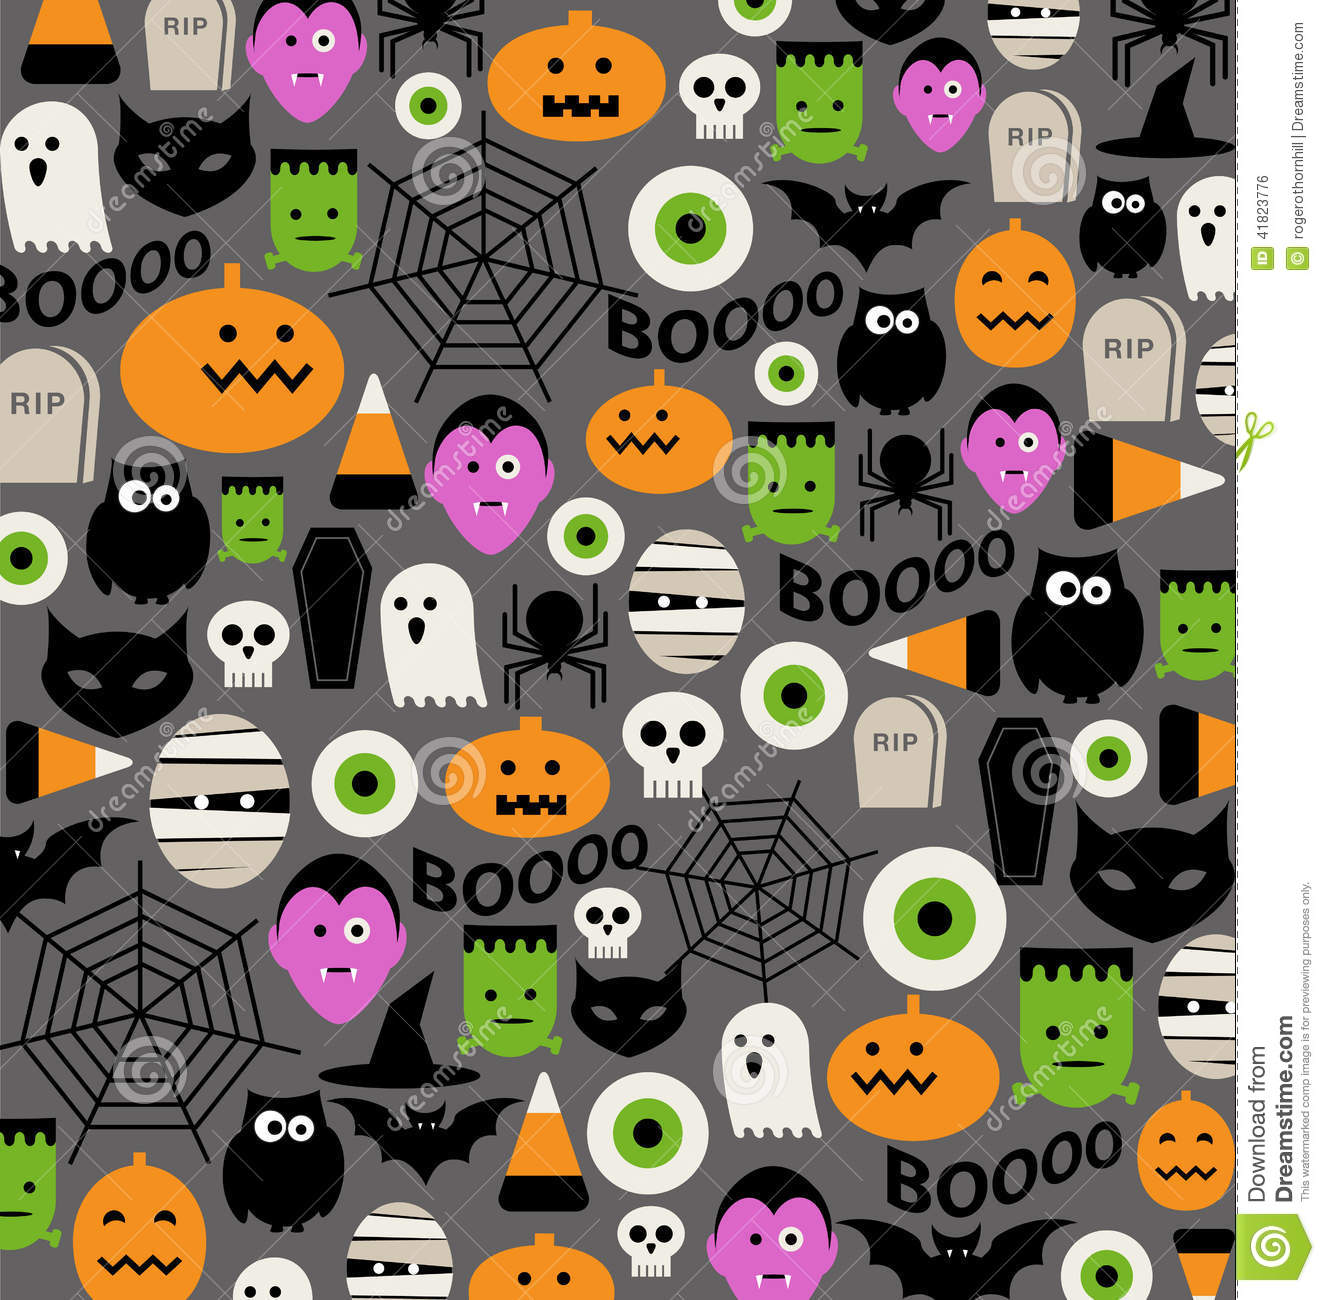 [74+] Cute Halloween Backgrounds On WallpaperSafari